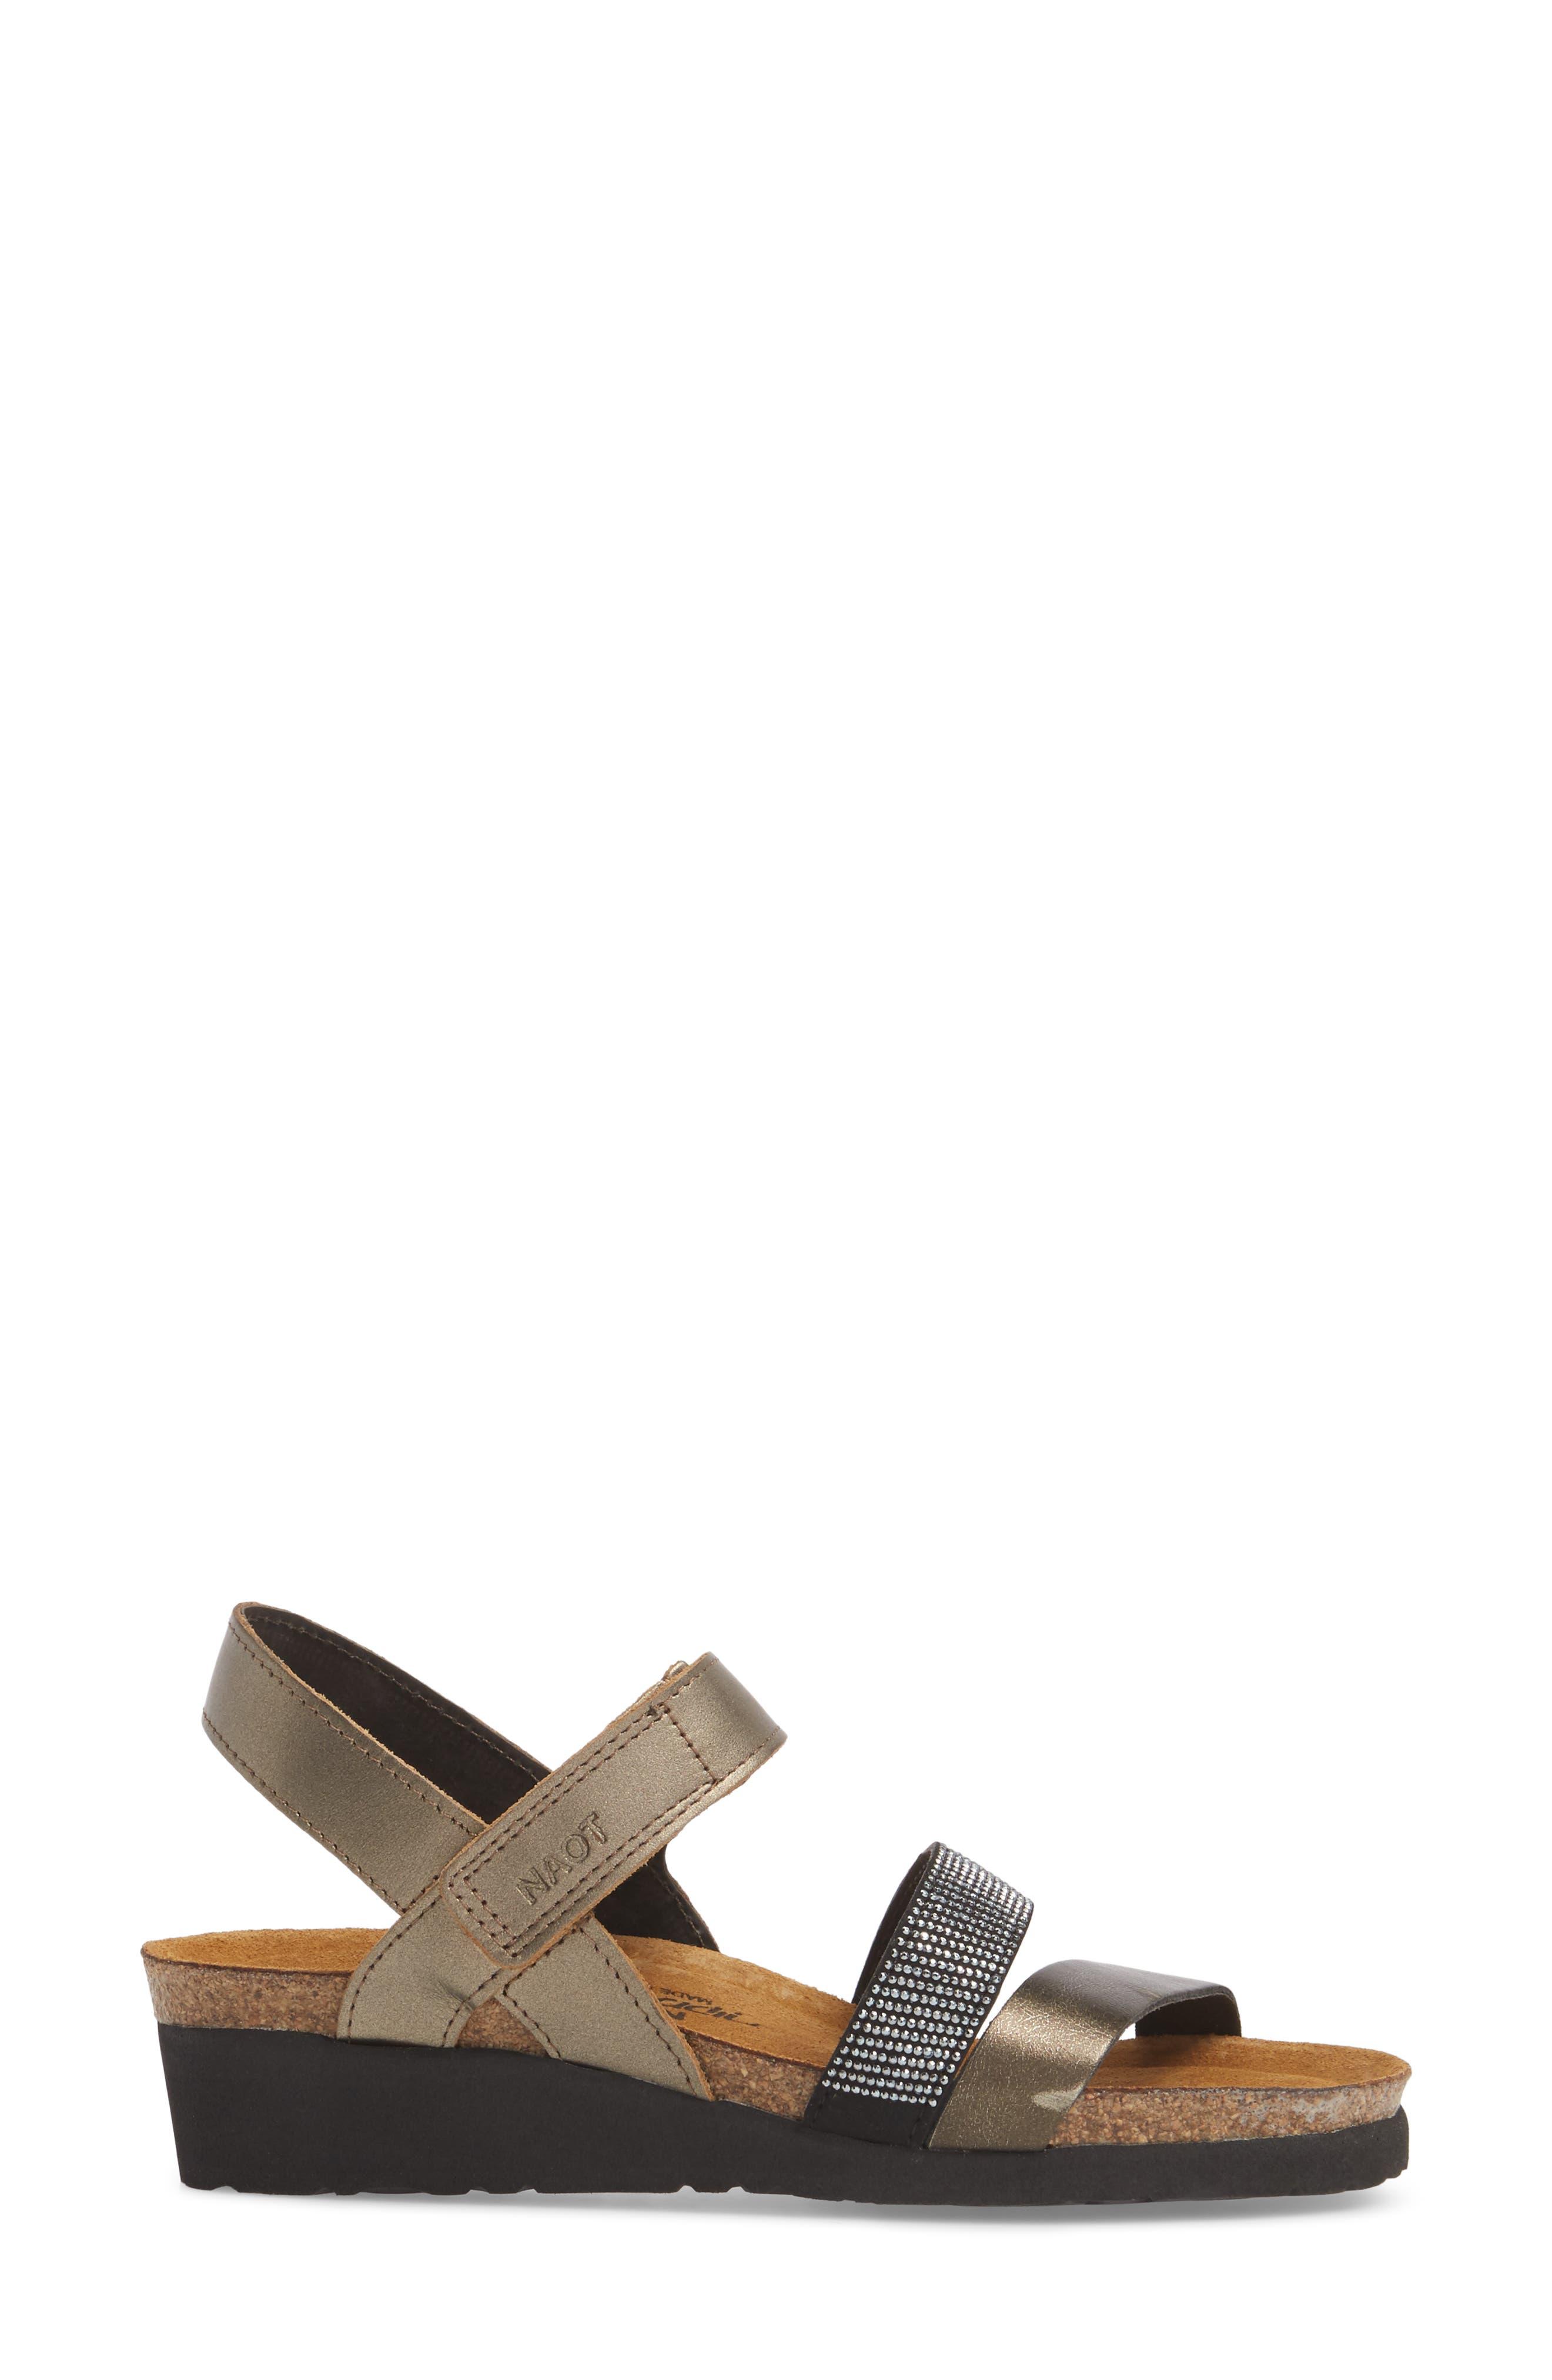 'Krista' Sandal,                             Alternate thumbnail 3, color,                             PEWTER LEATHER